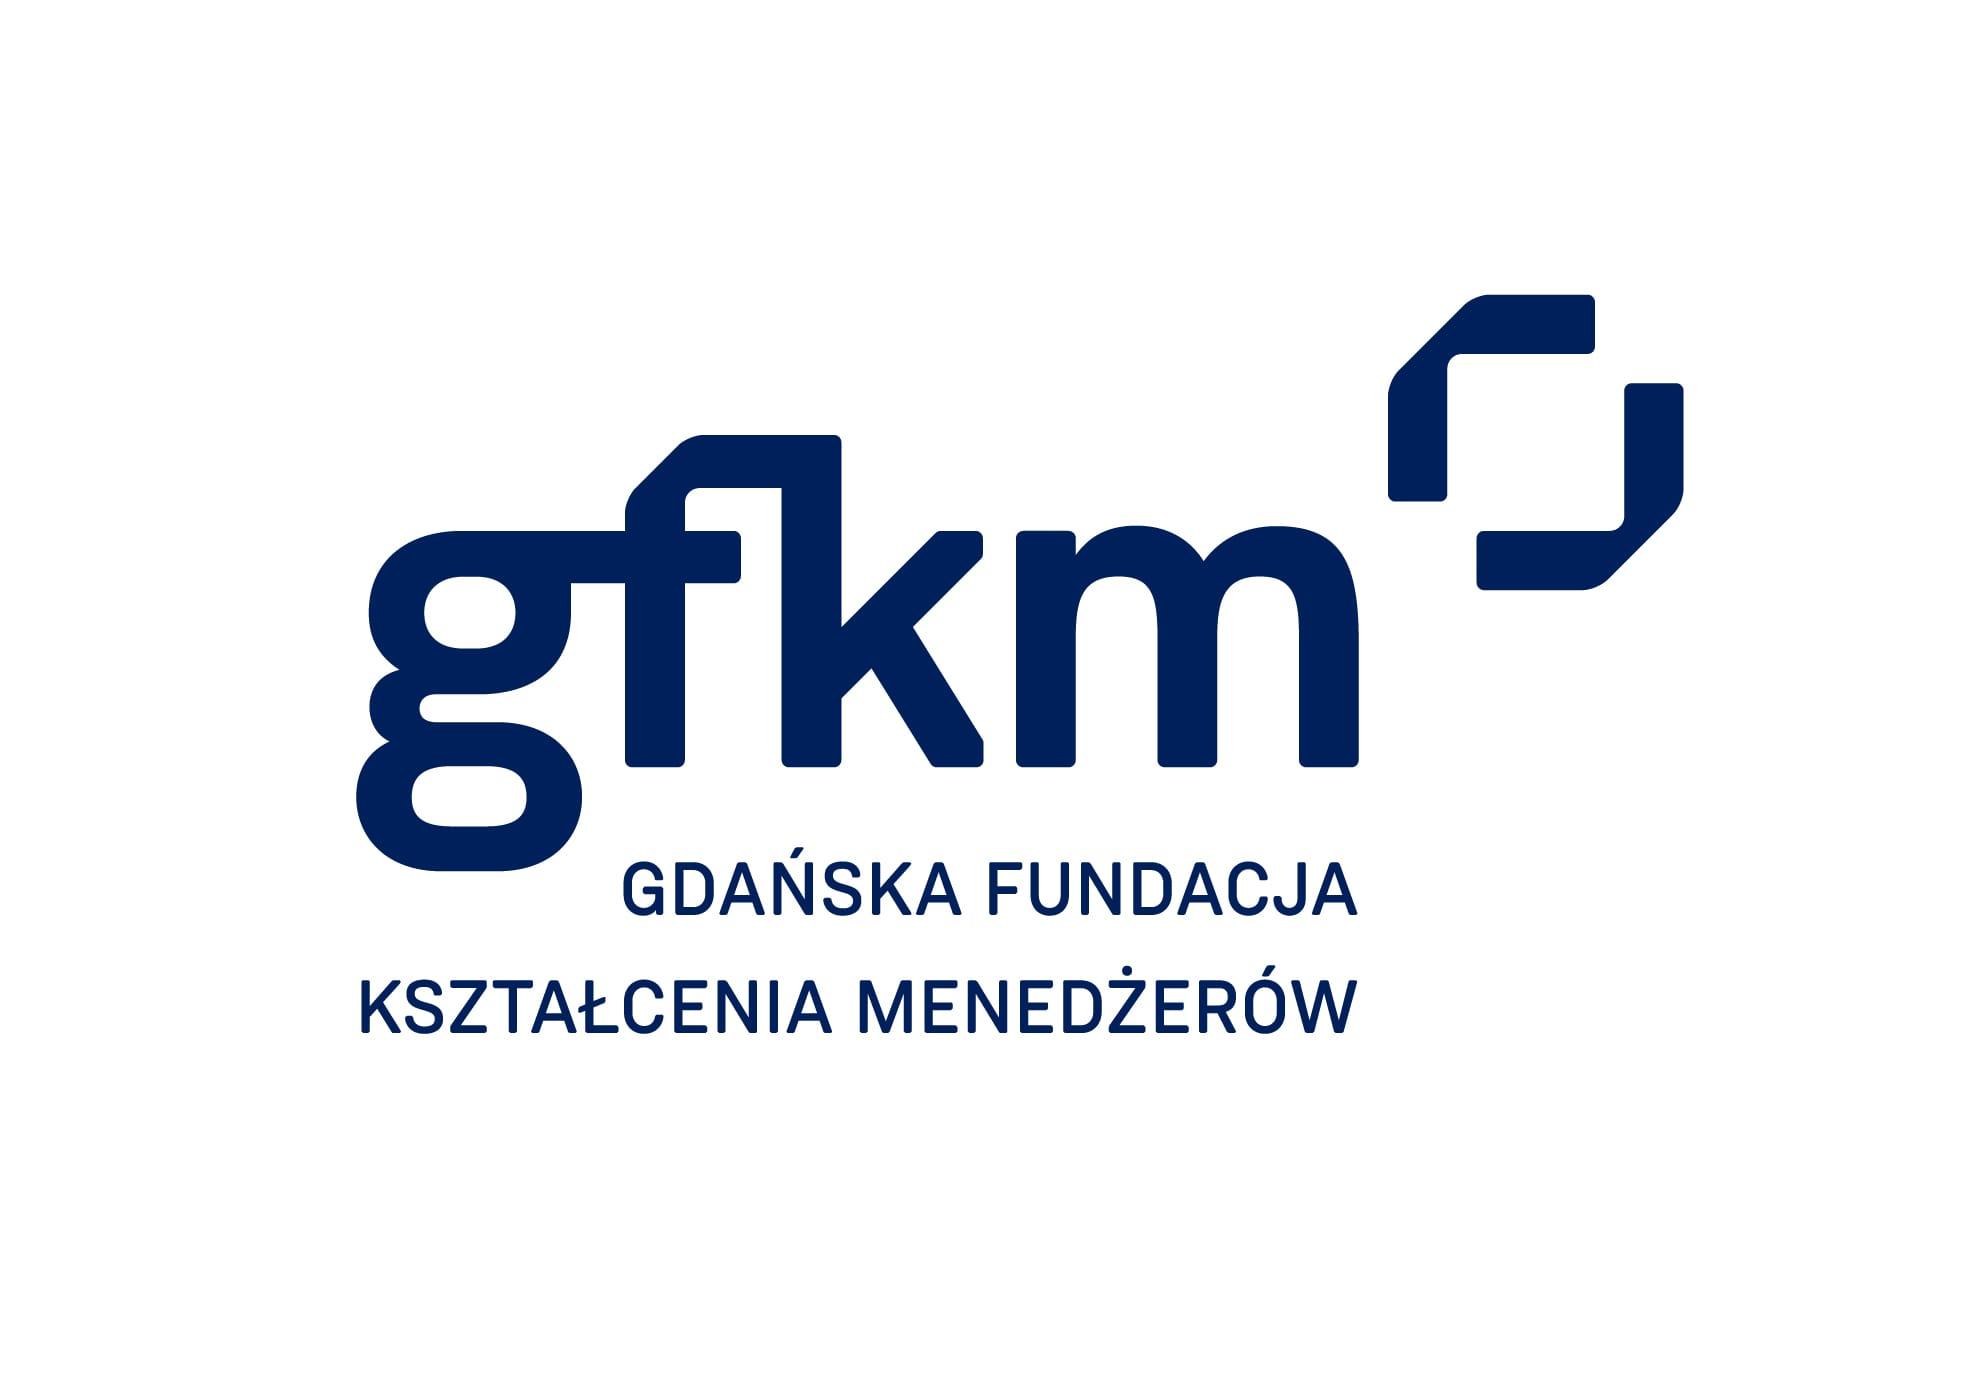 GFKM_logo